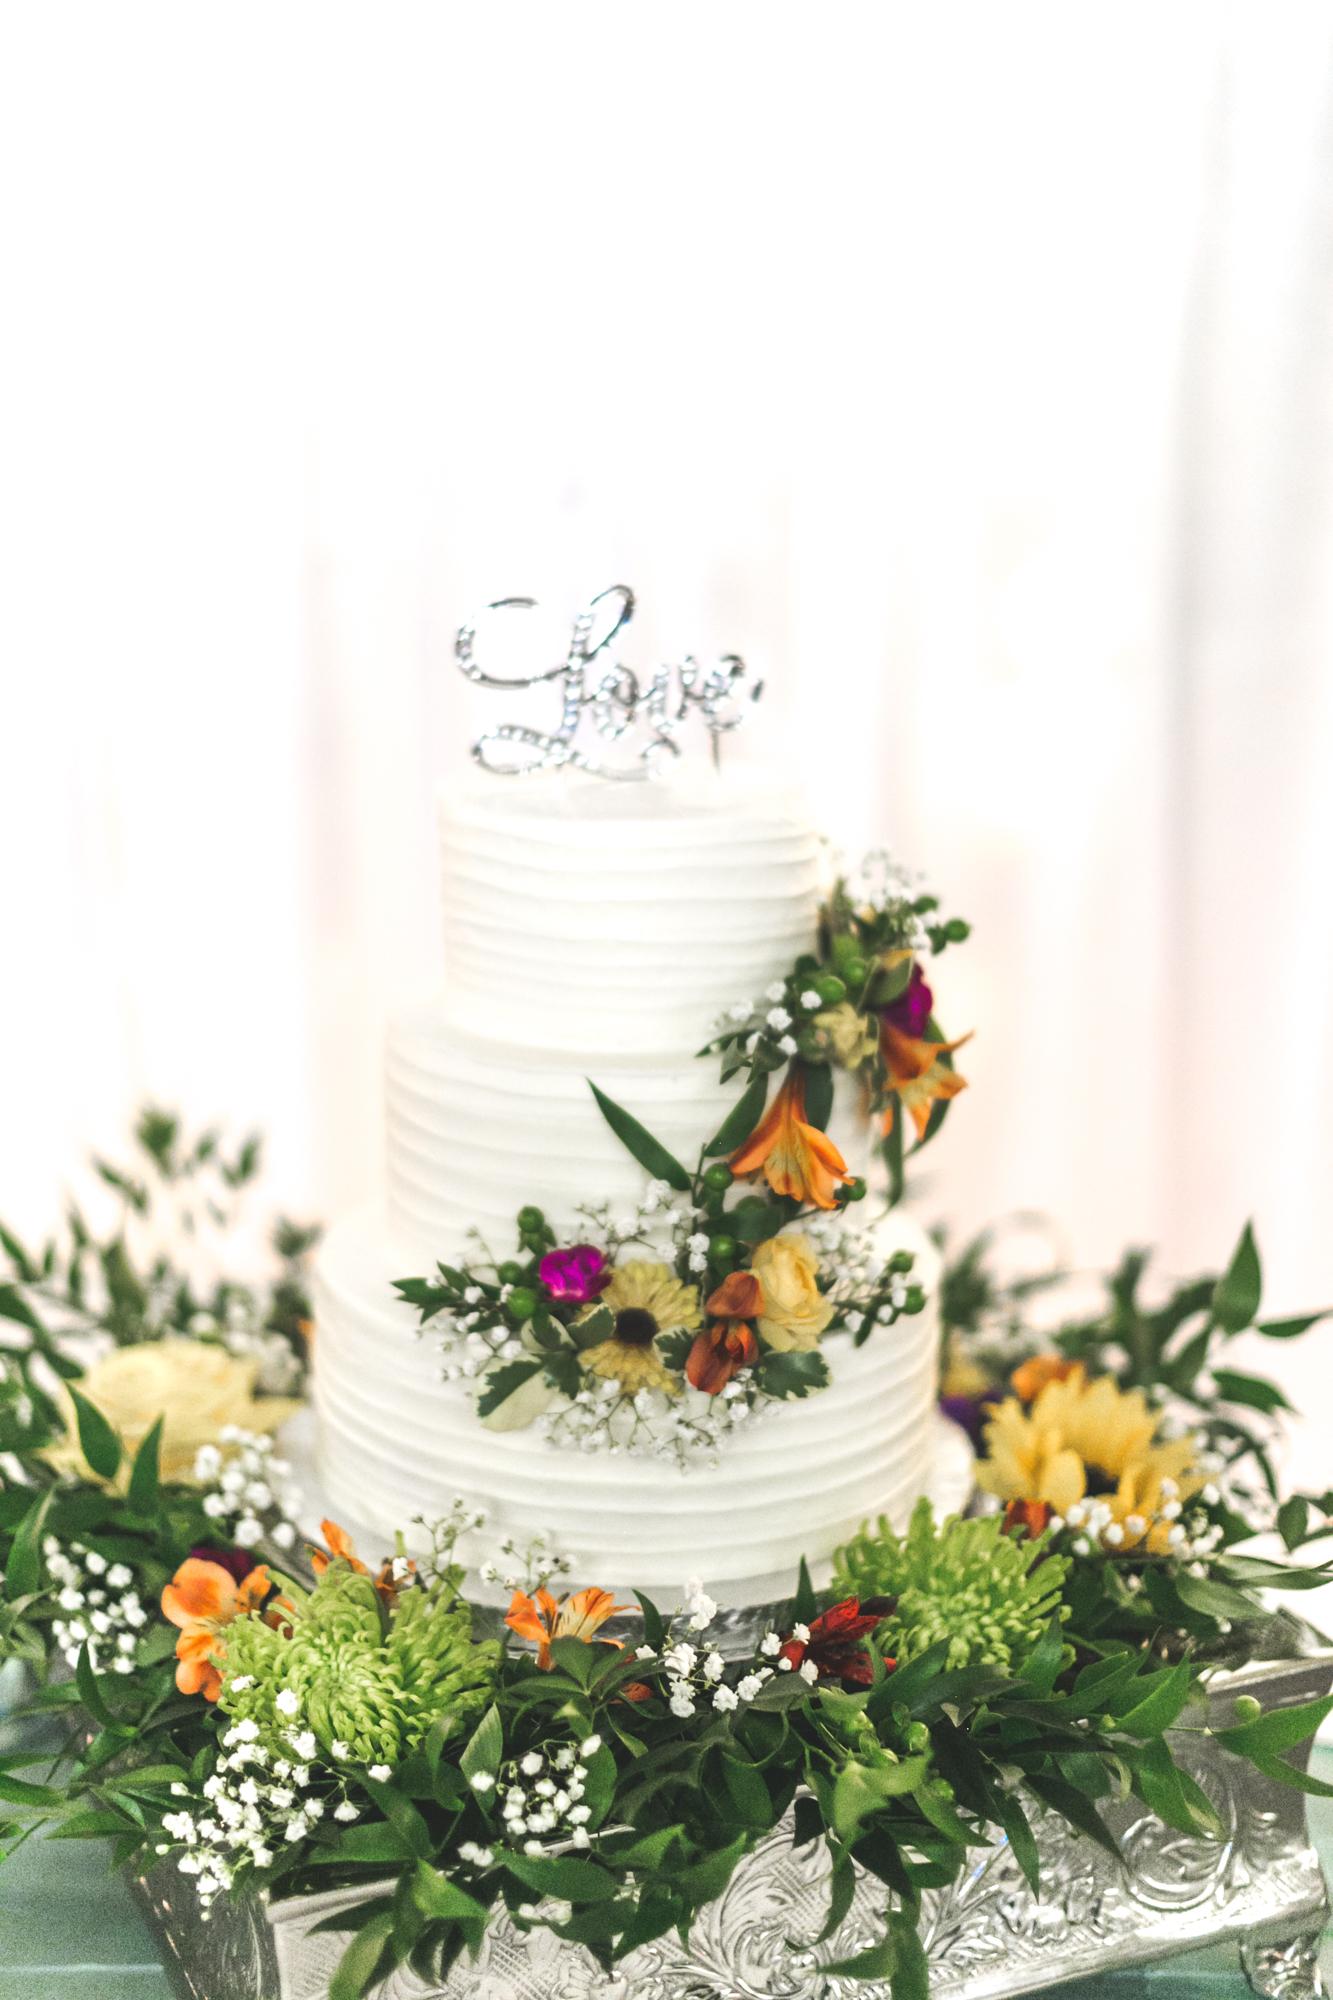 Seymour-Matte Wedding-32.jpg